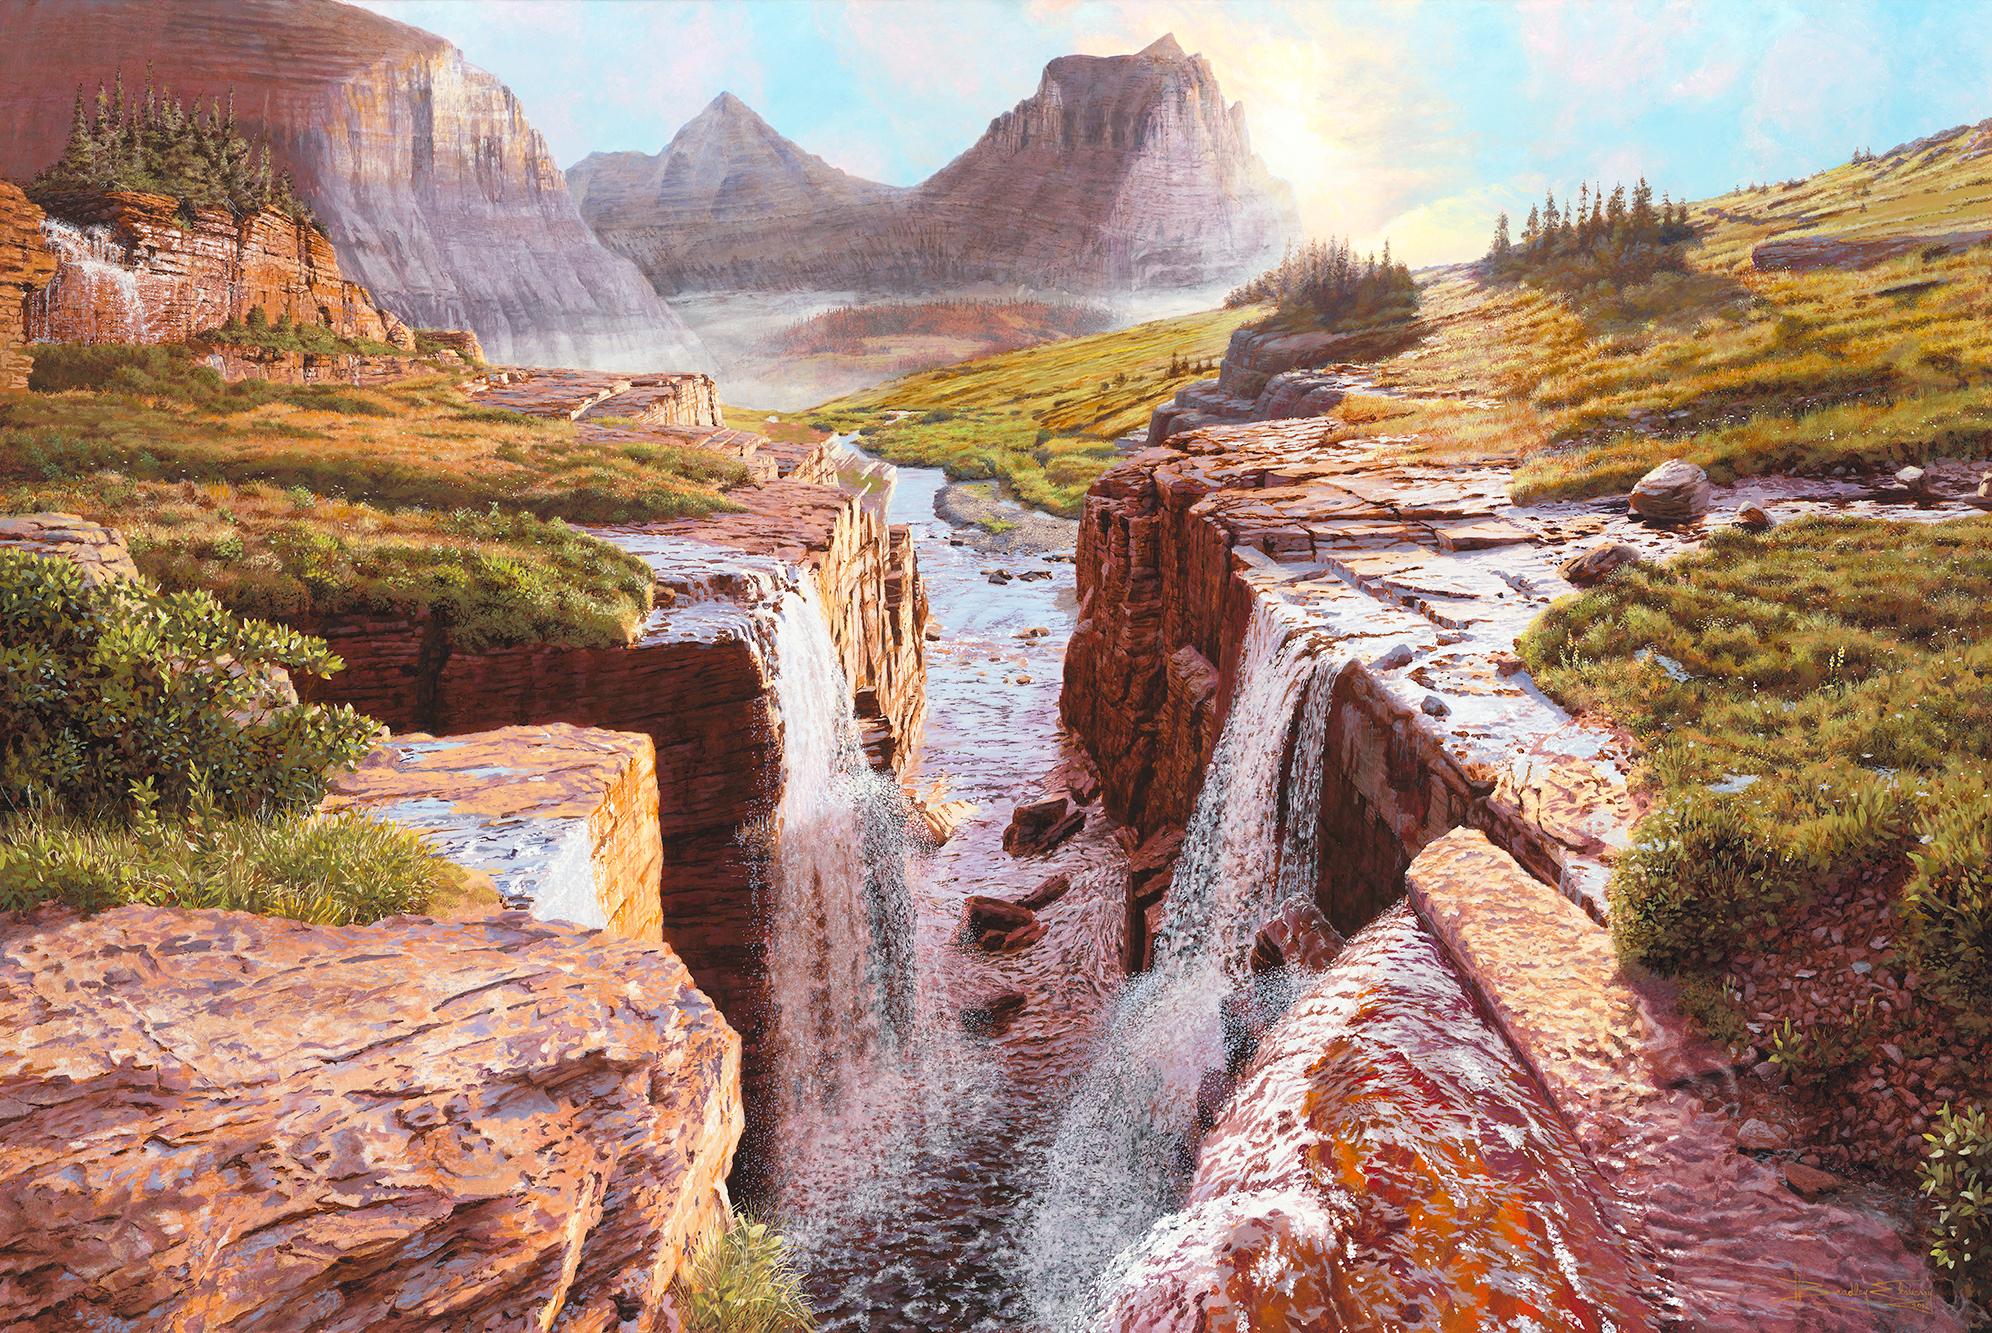 The Triple Waterfall below Logan Pass